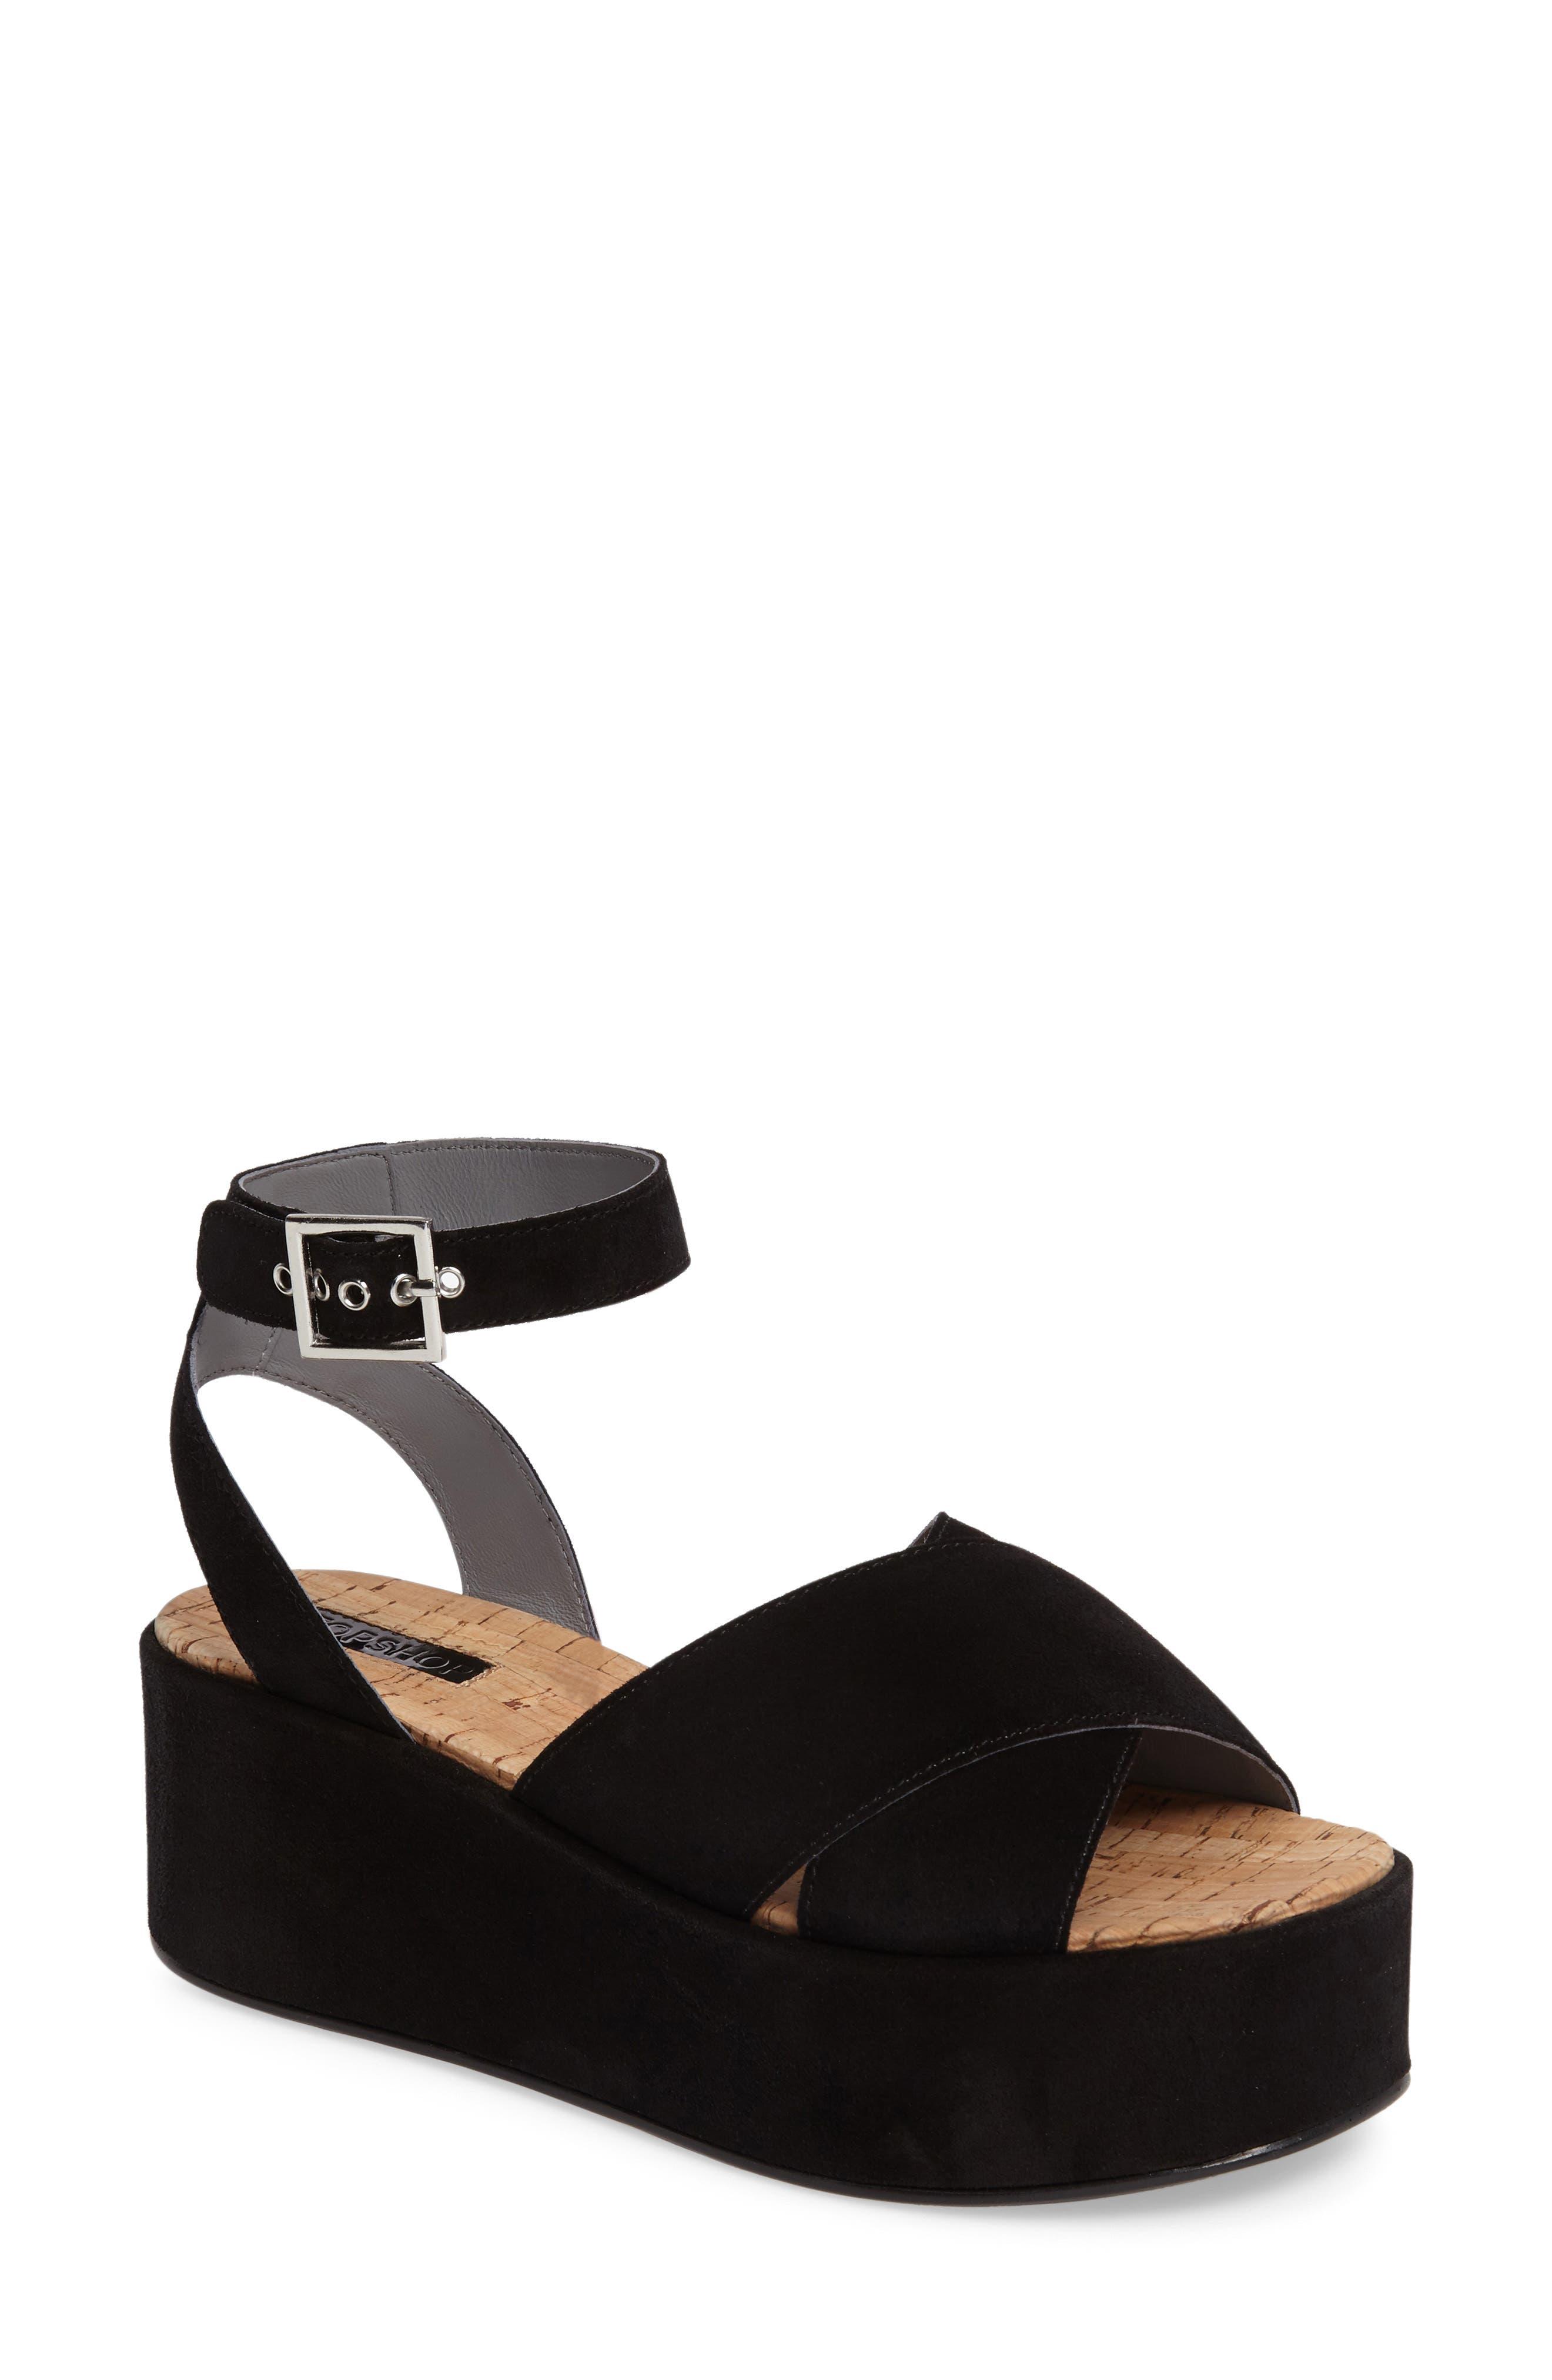 Whisper Platform Sandal, Main, color, 001